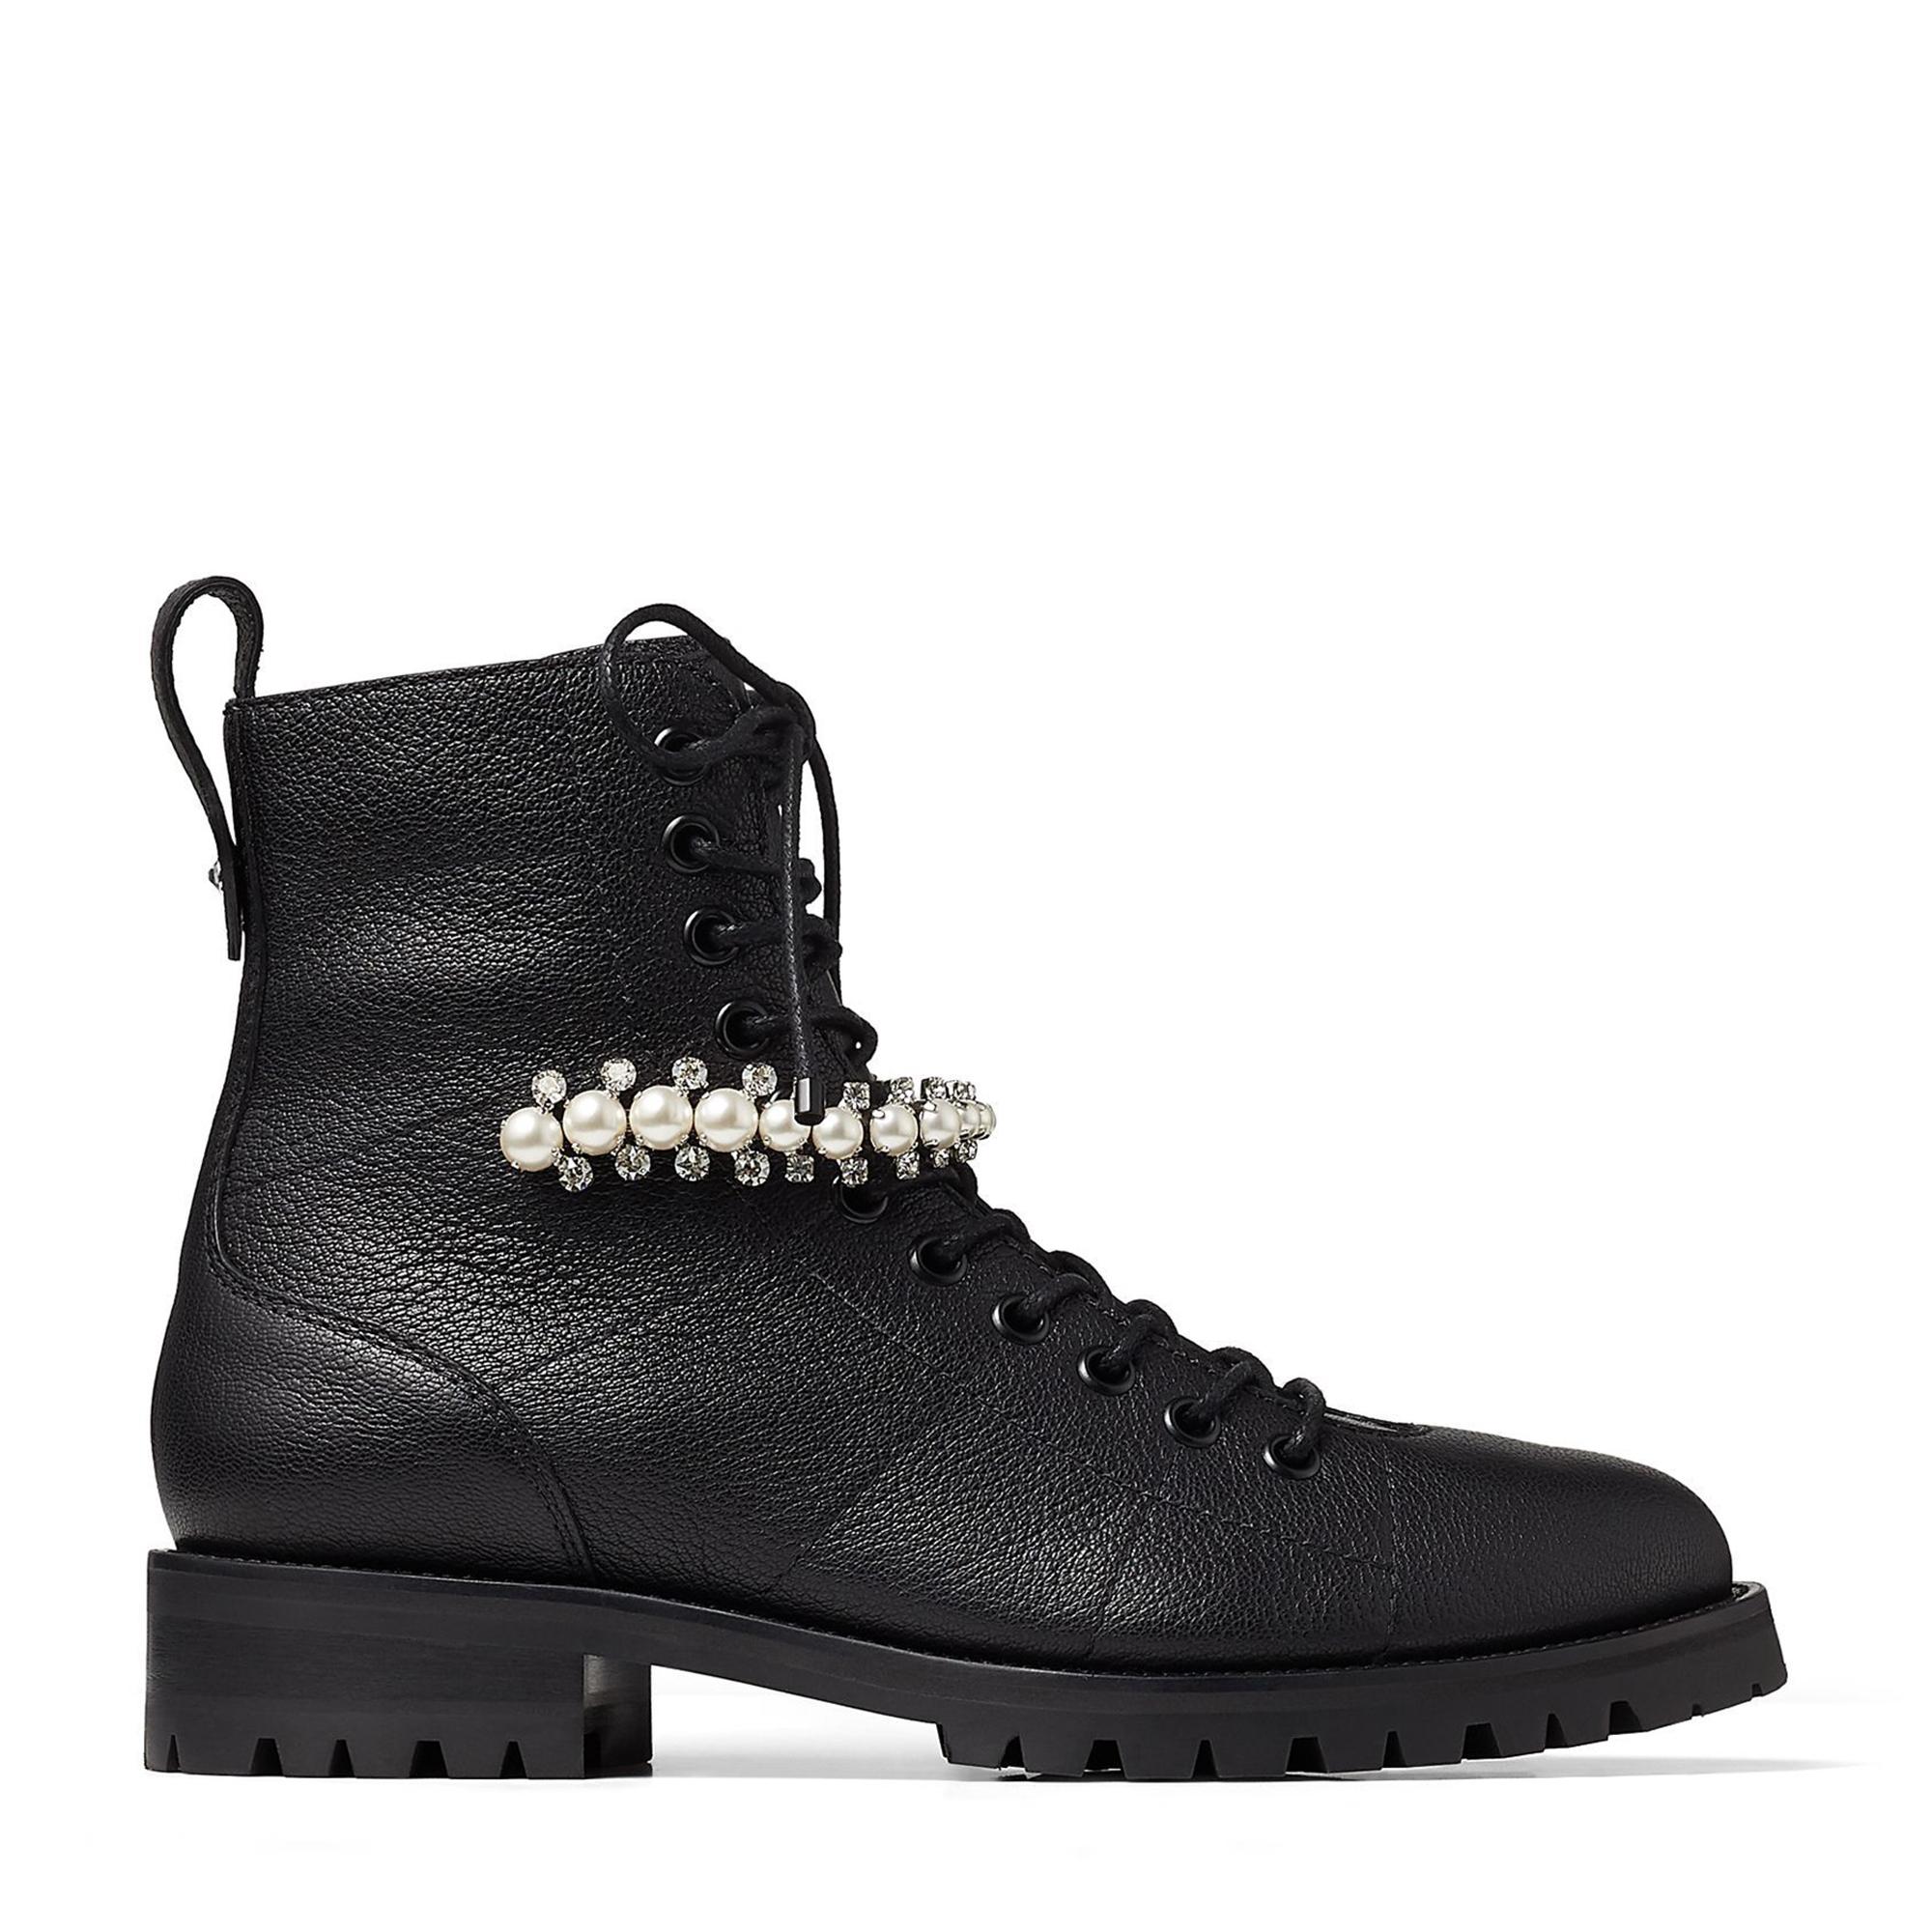 Cruz flat boots